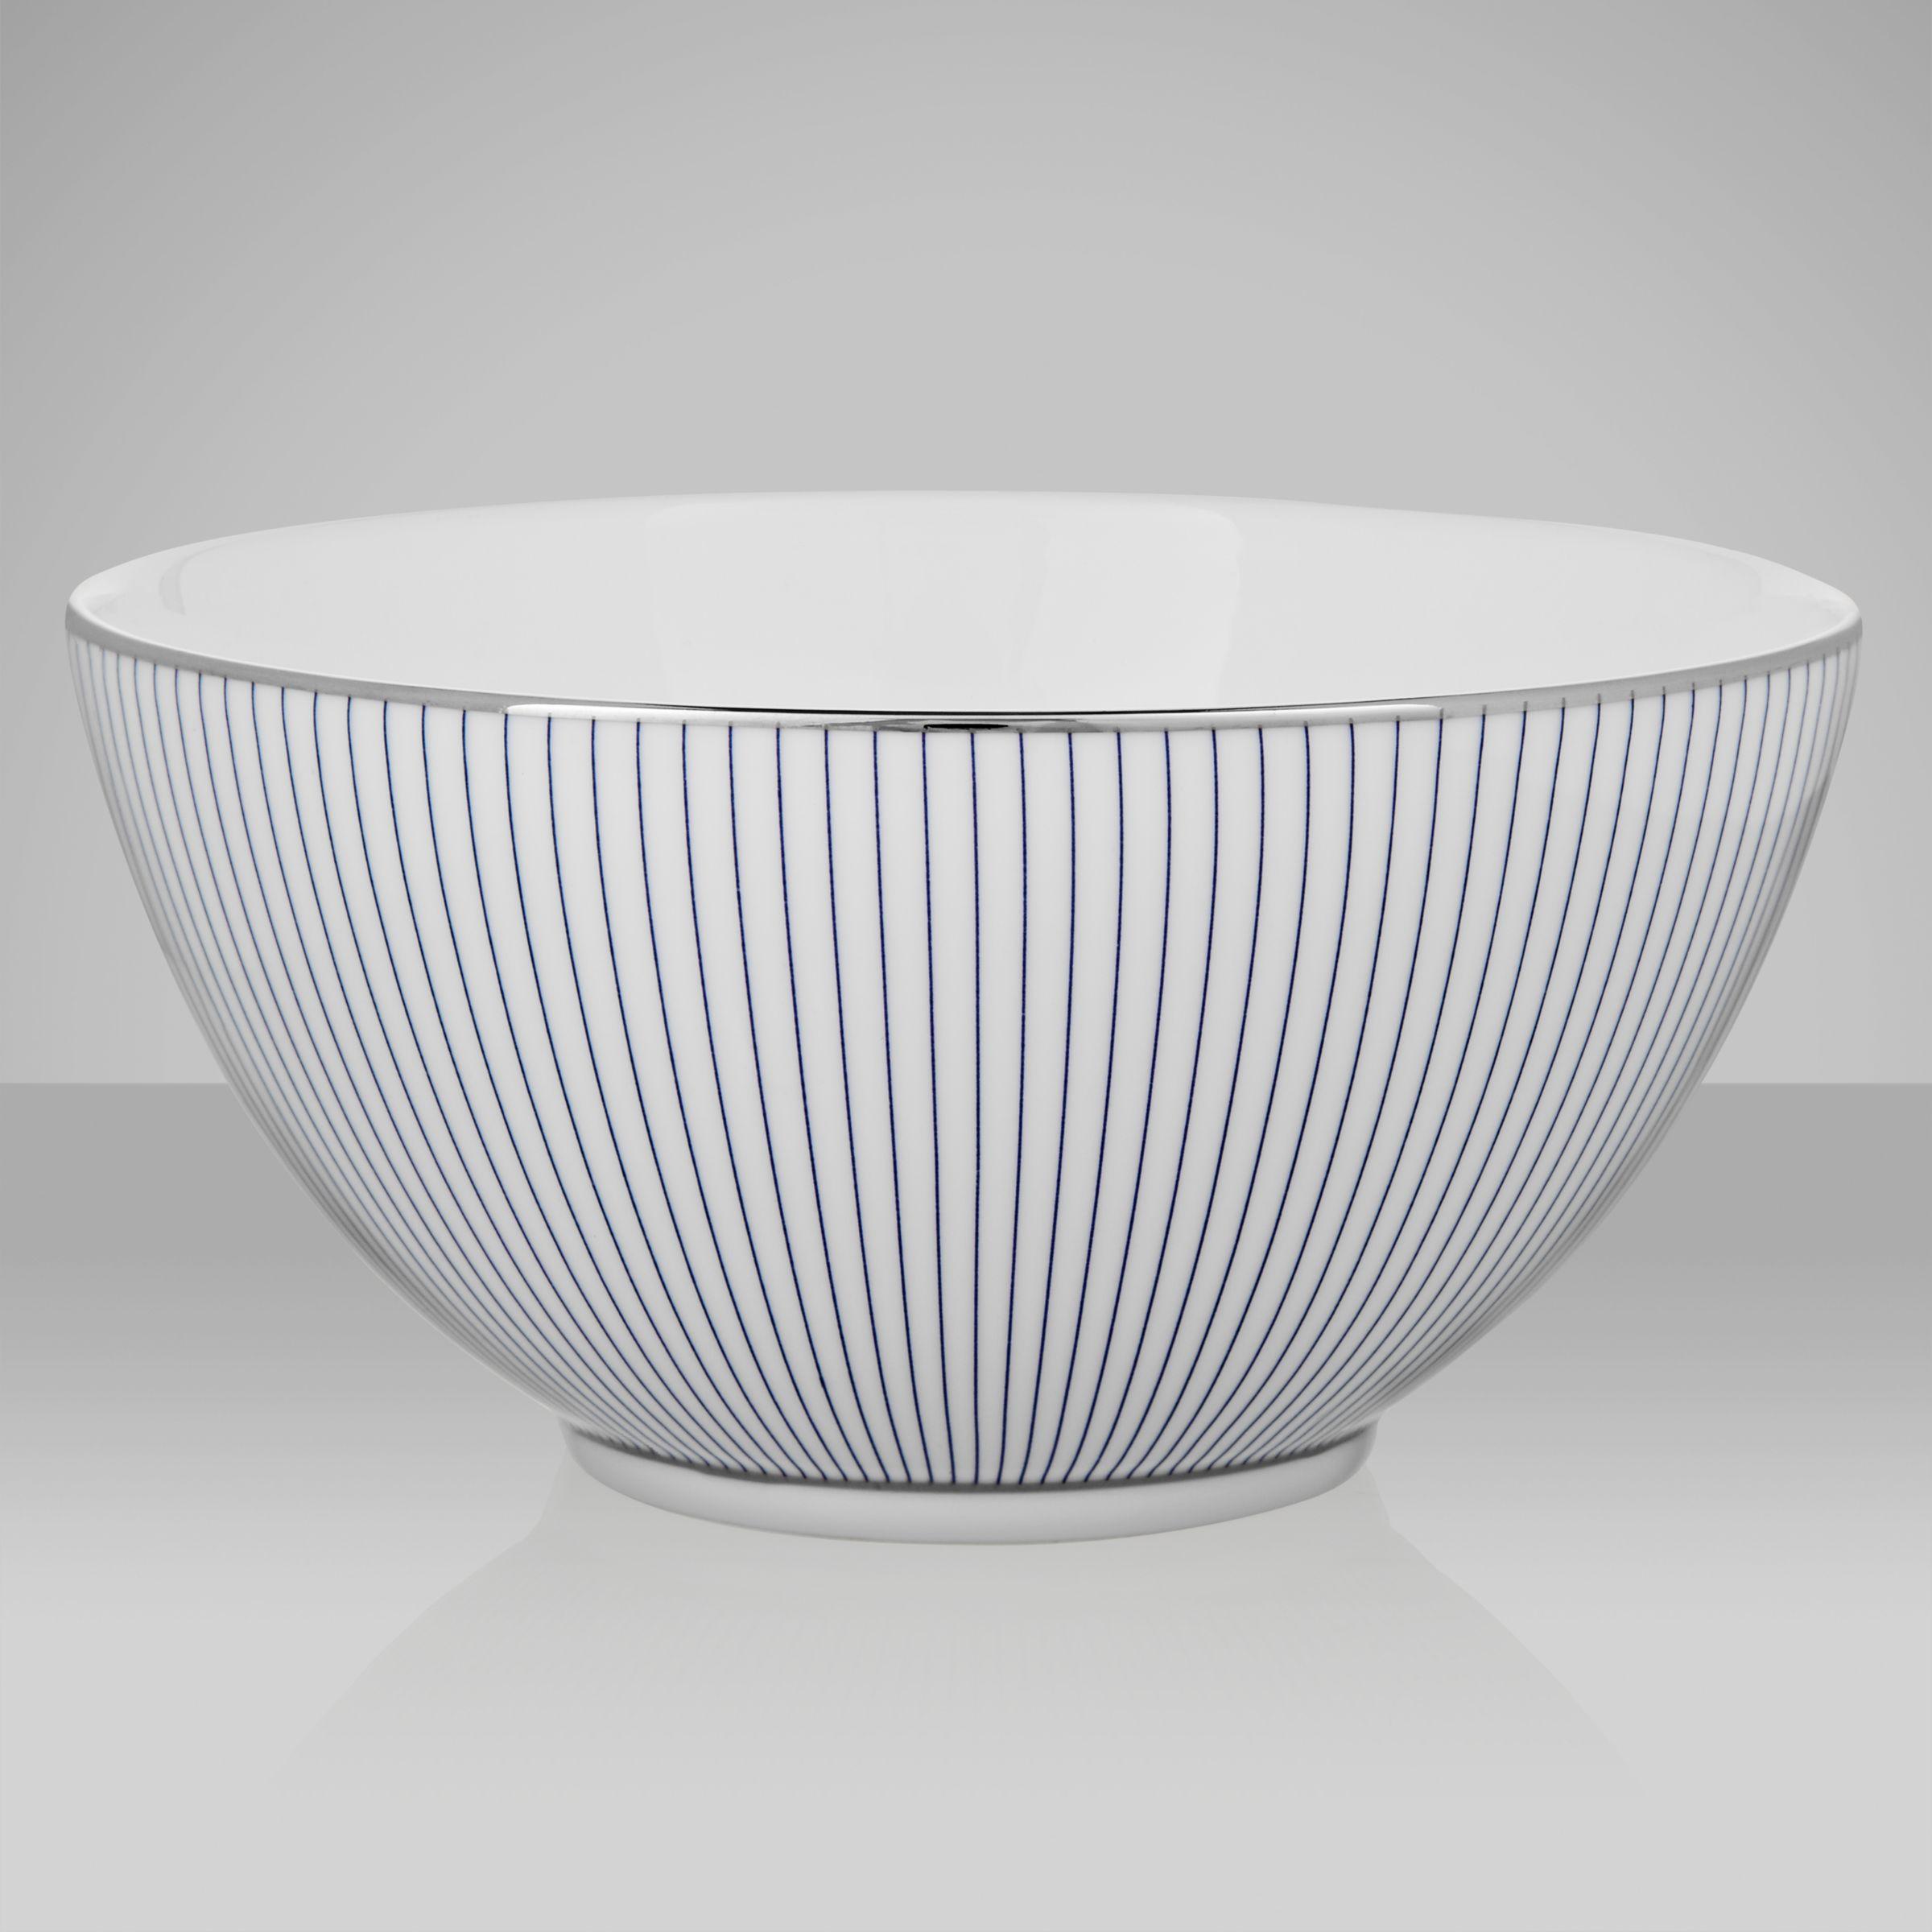 Jasper Conran Jasper Conran for Wedgwood Pinstripe Gift Bowl, 14cm